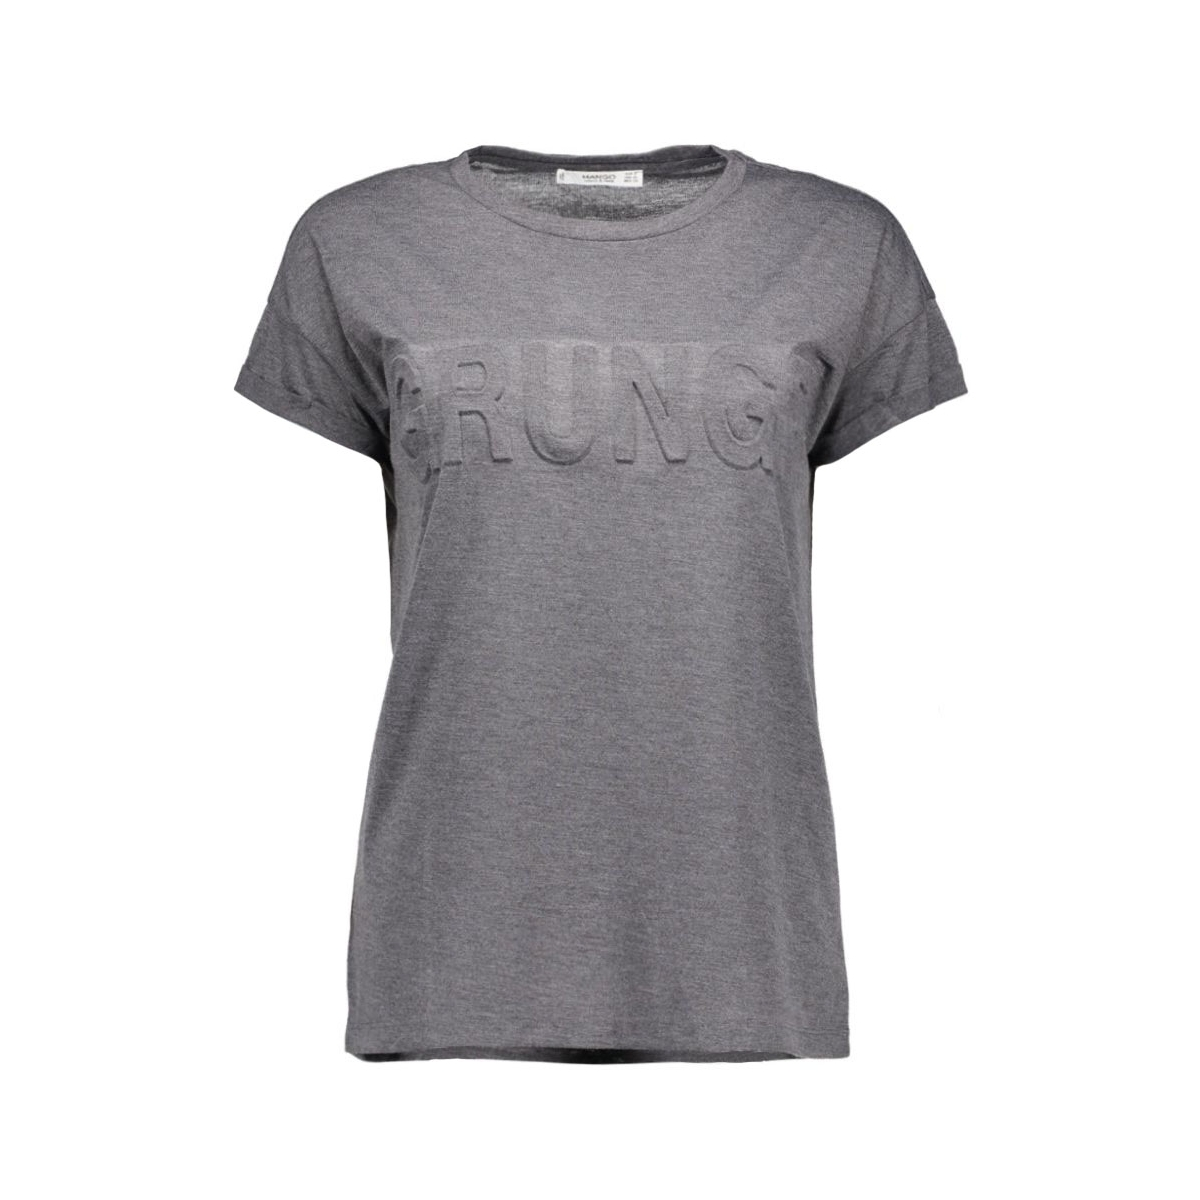 t-shirt emboss7 mango t-shirts 73903013-96